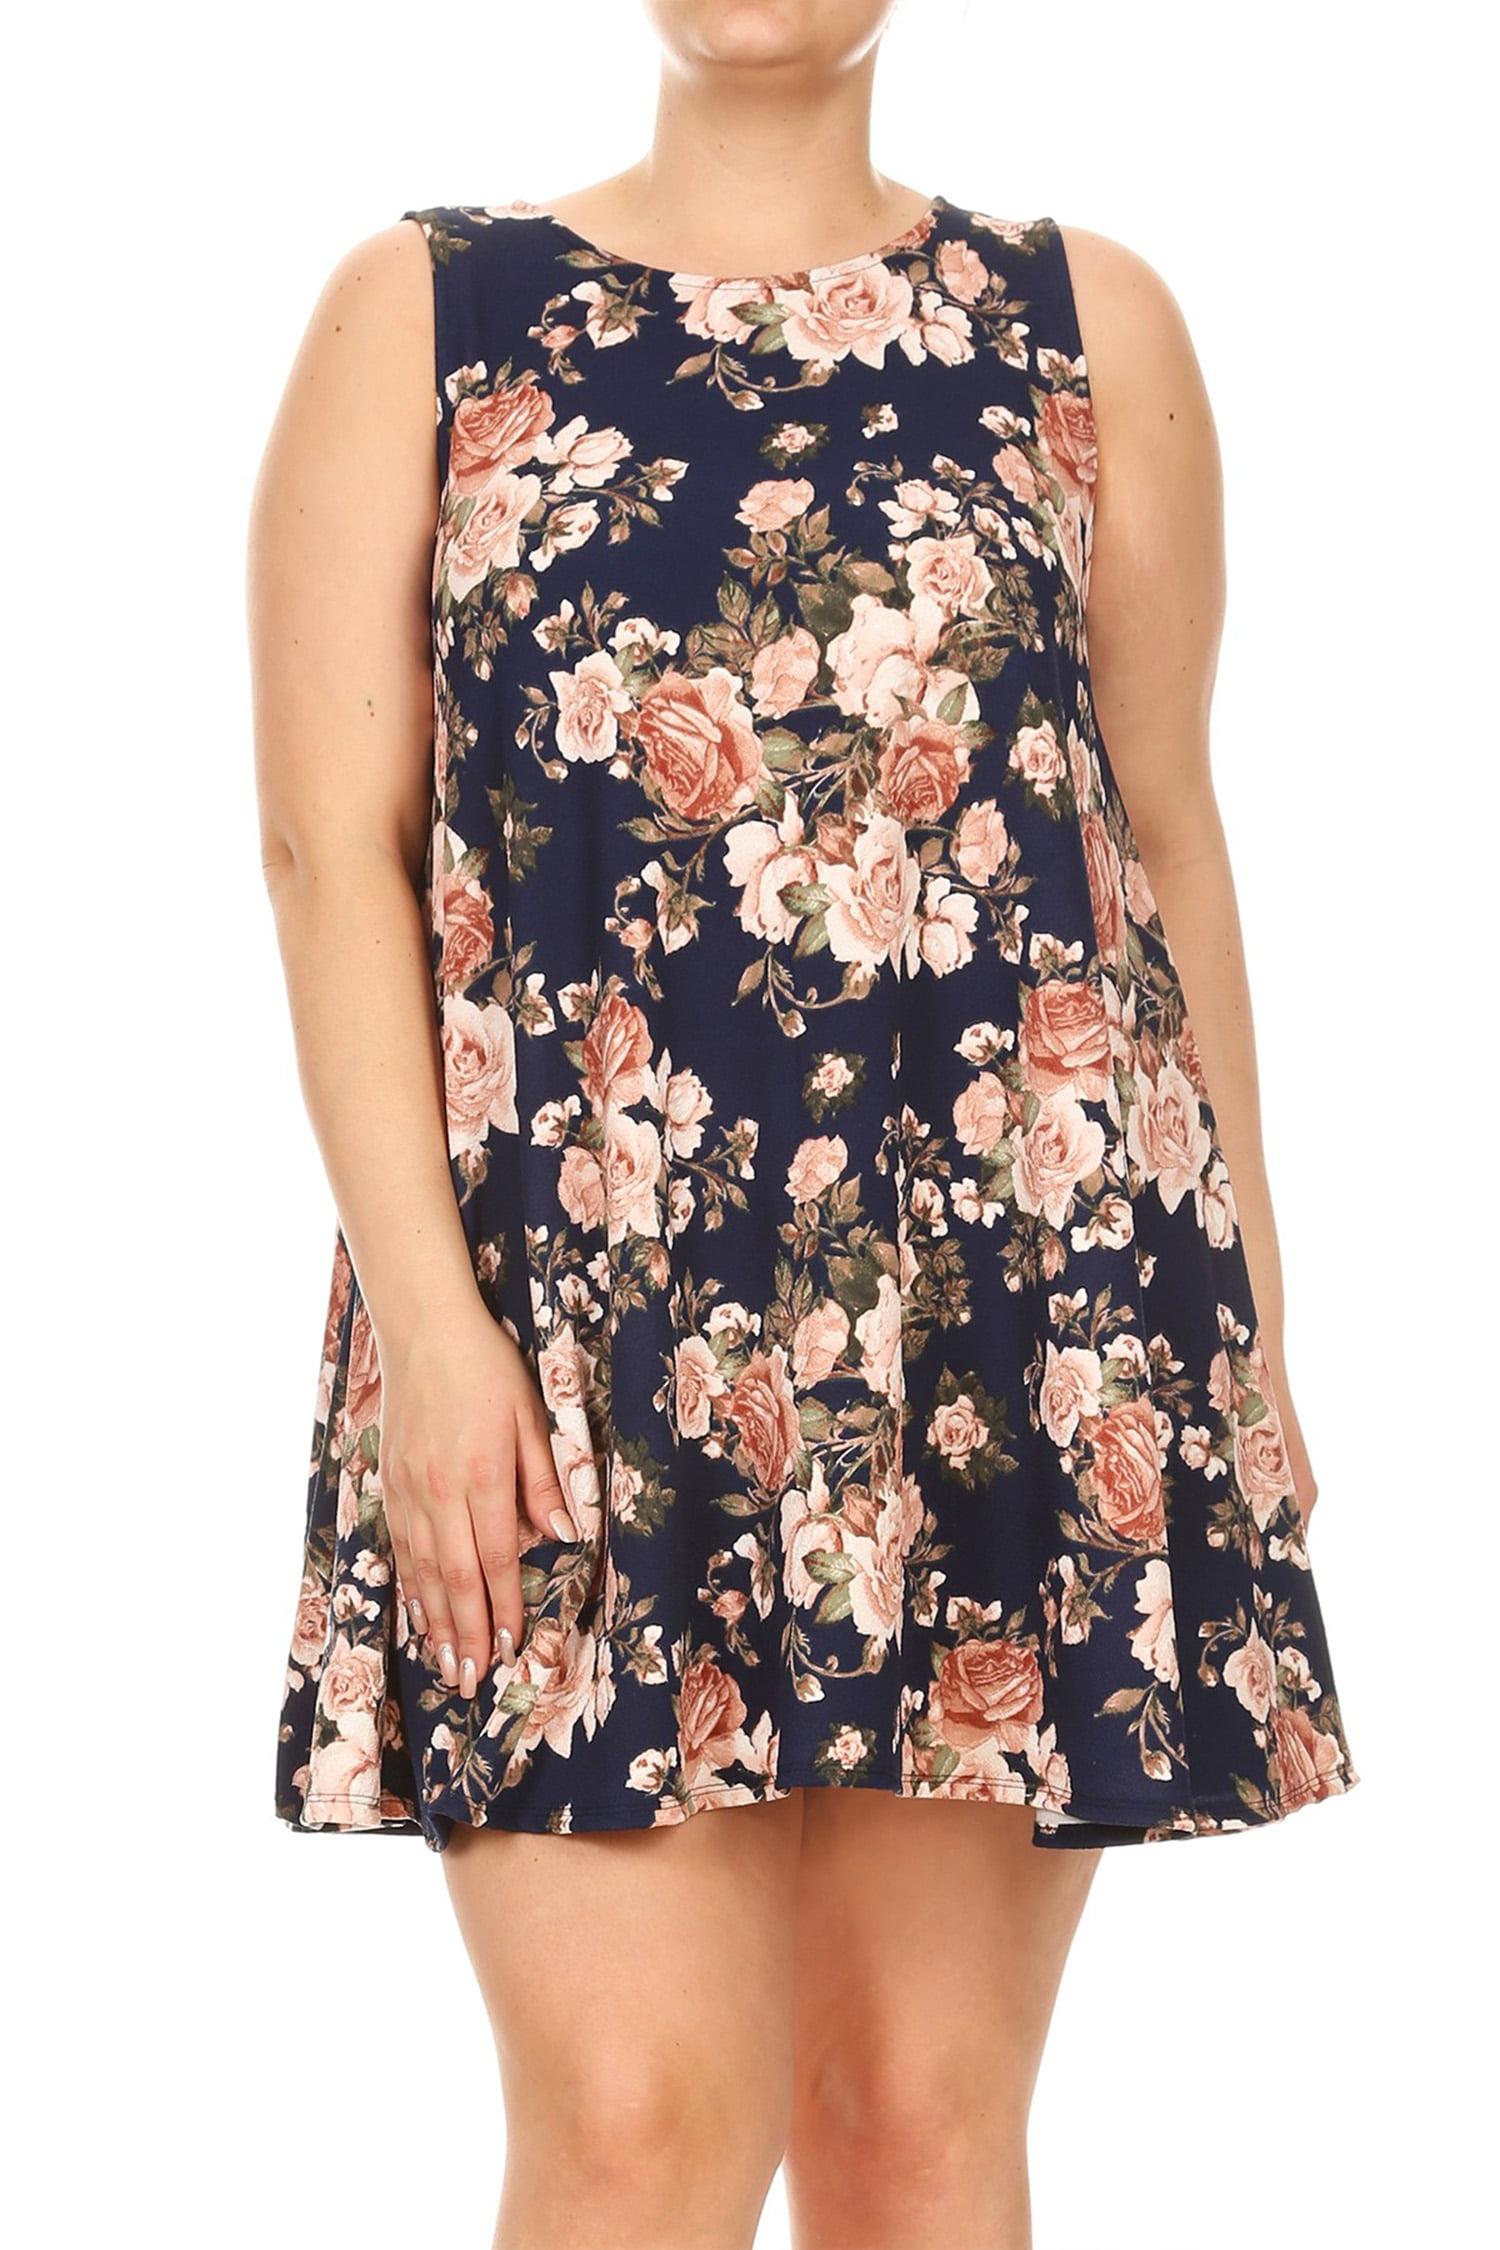 Women's Plus Size Floral Pattern Dress